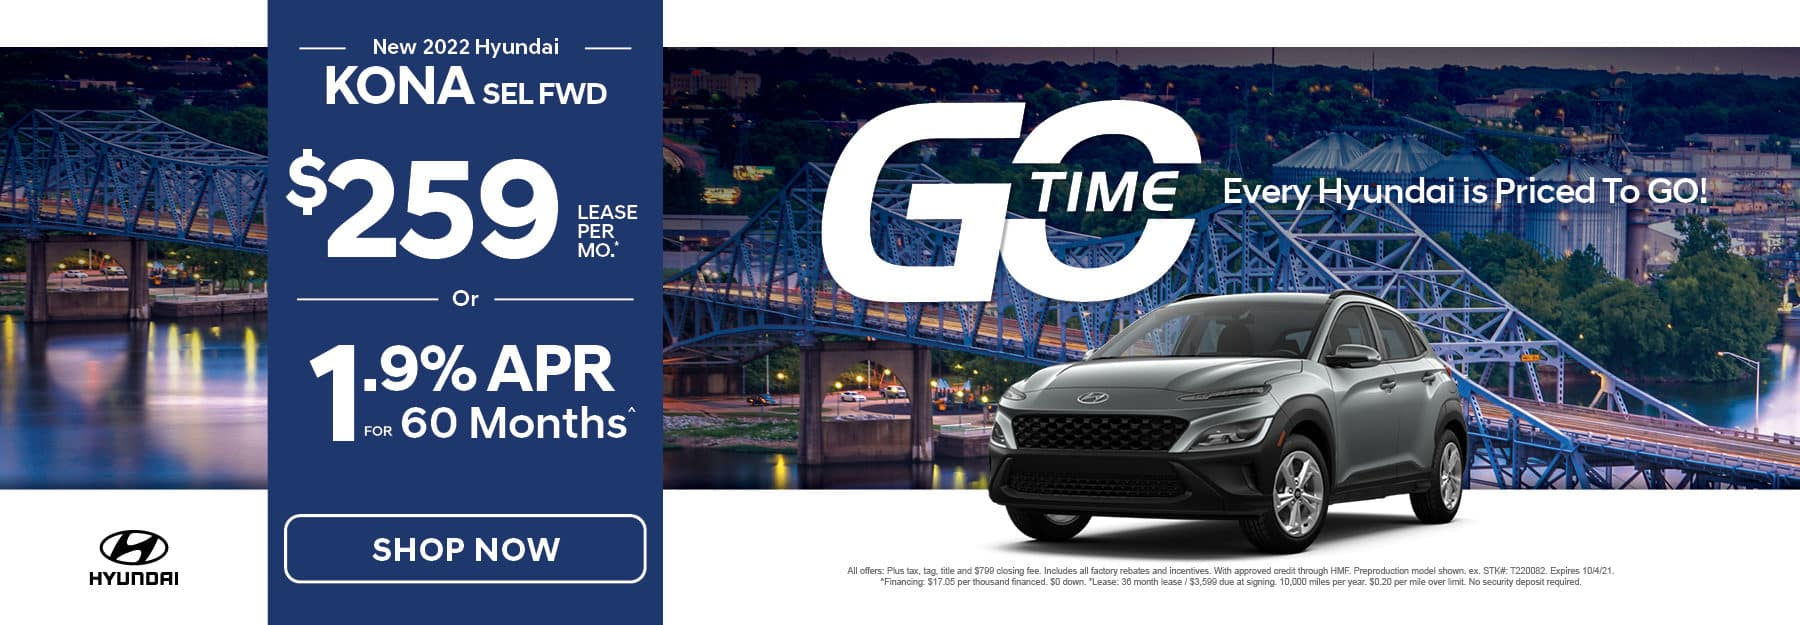 Go Time - New 2022 Hyundai Kona